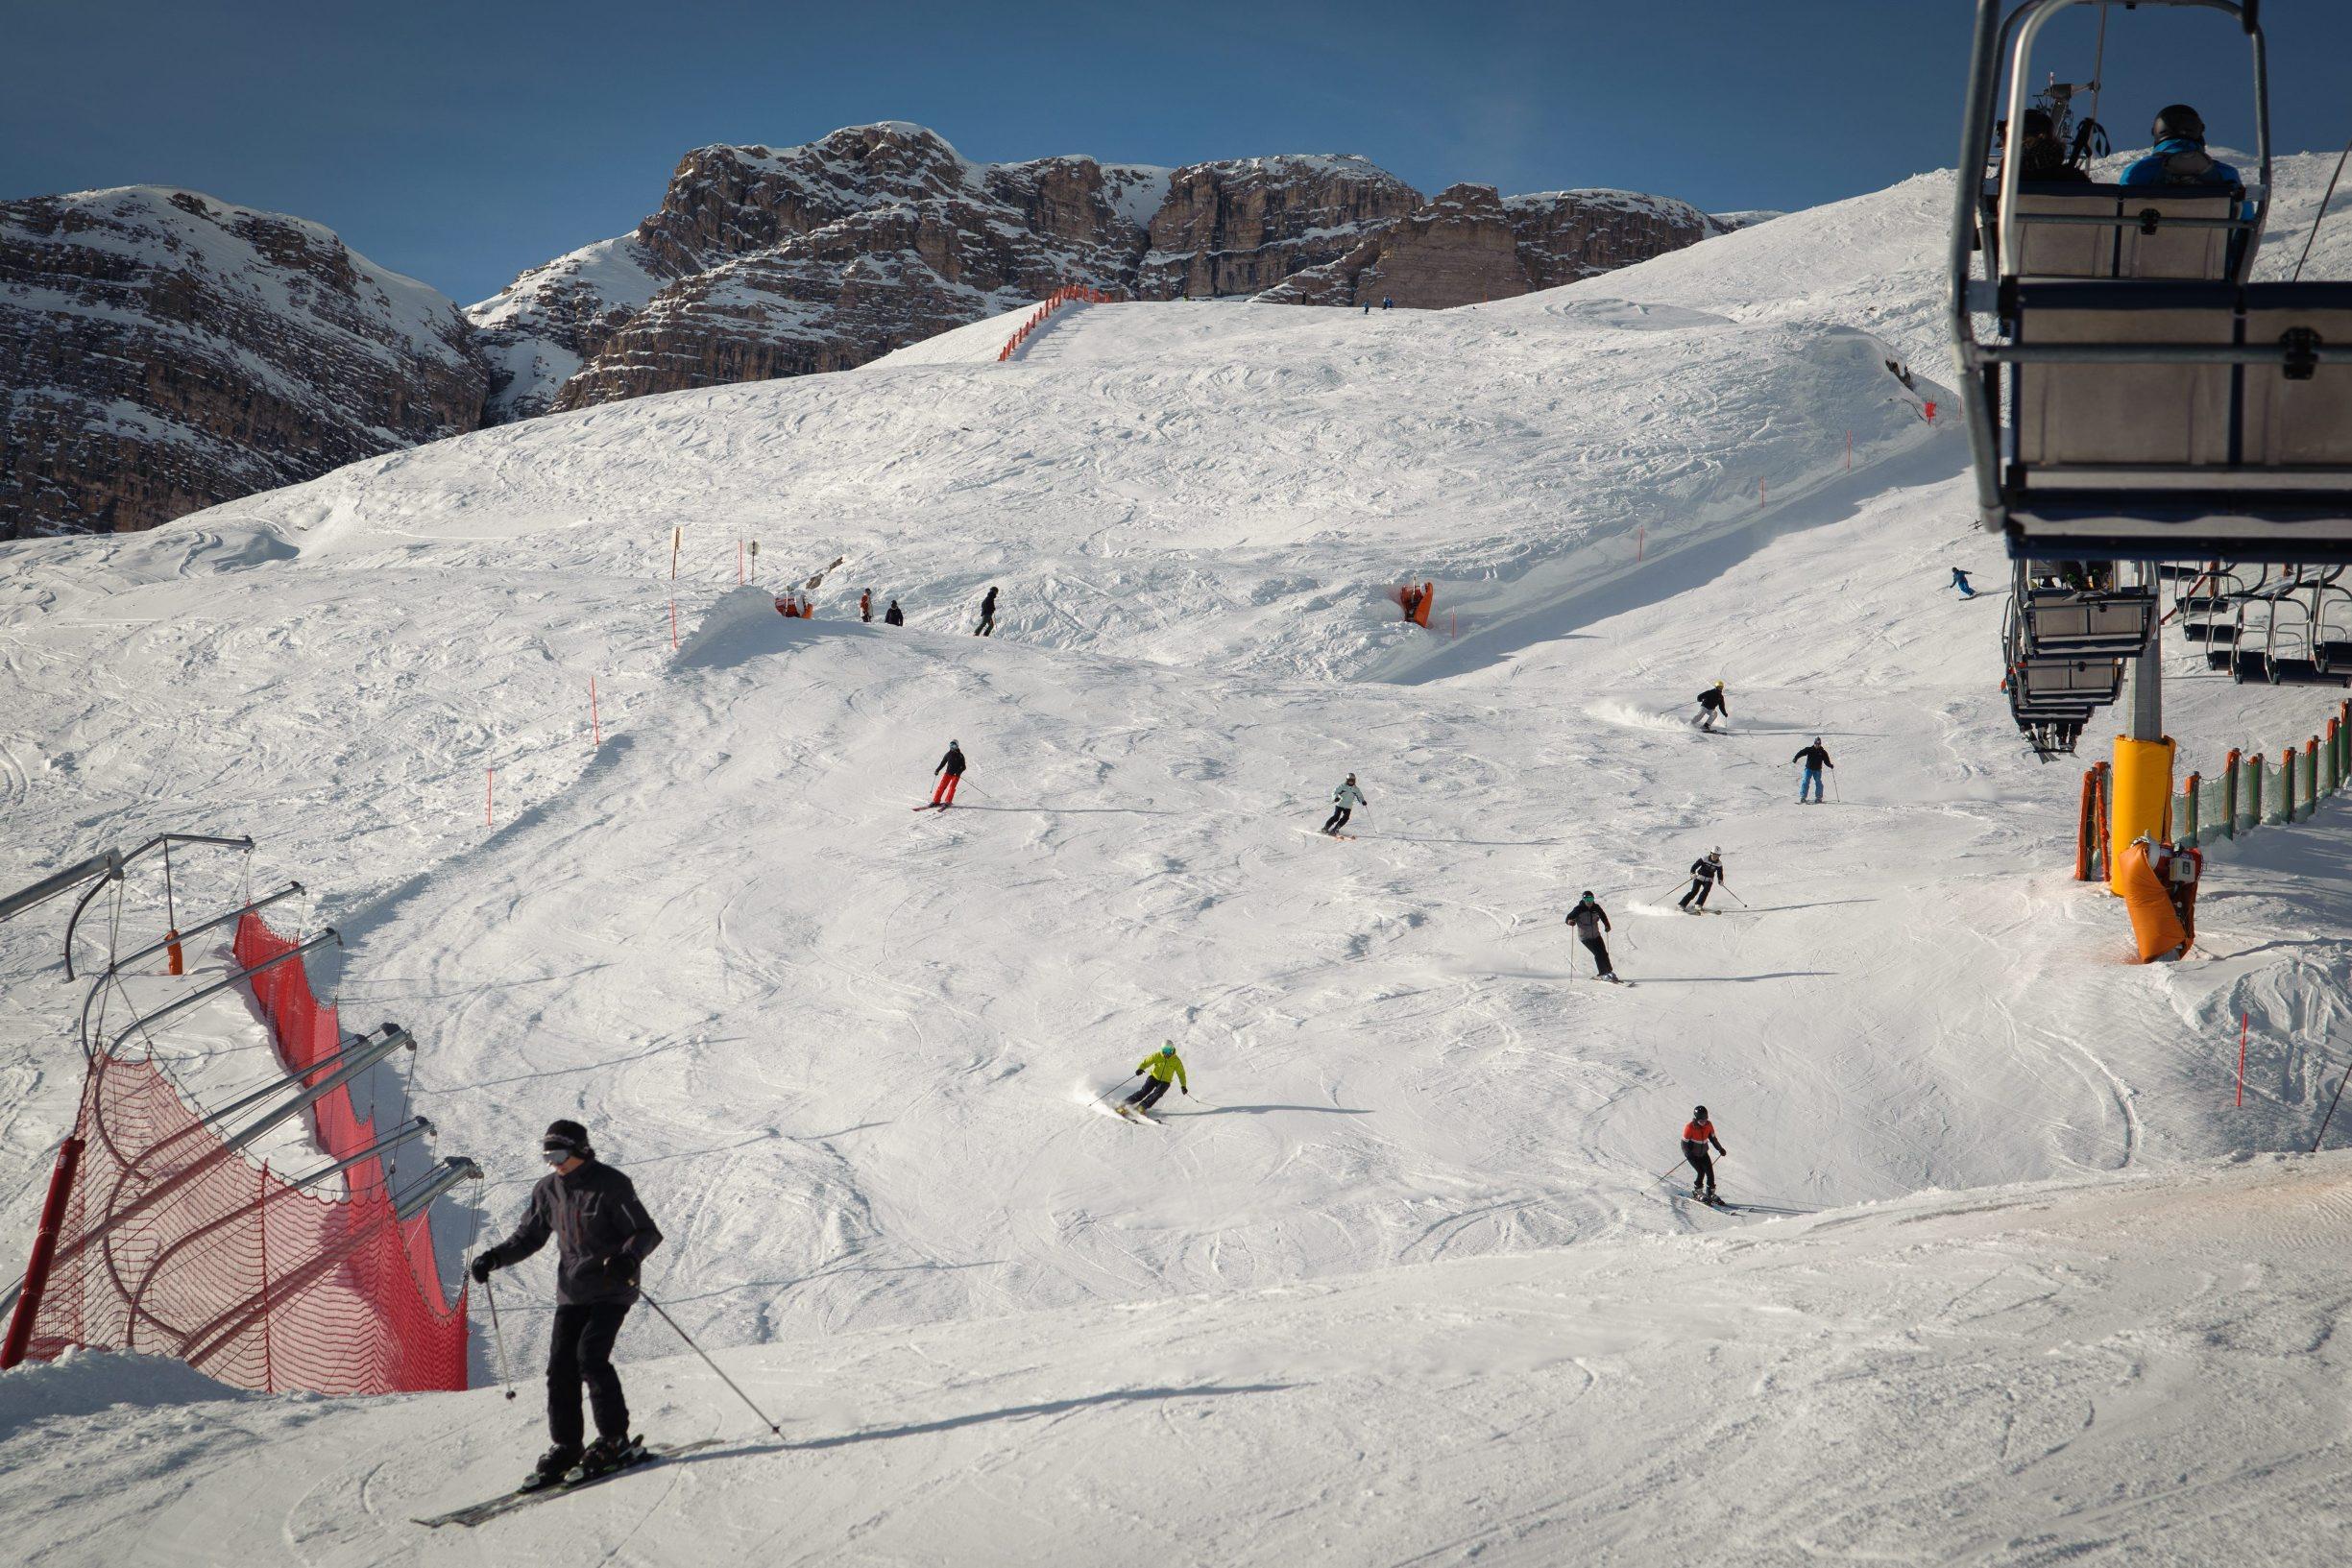 Alta Badia, Italija, 151219. Ski patrola - Alta Badia, skijaliste u Dolomitima sa 130 km povezanih skijaskih staza . Na fotografiji:  pogled na stazu Vallon Foto: Tom Dubravec / CROPIX